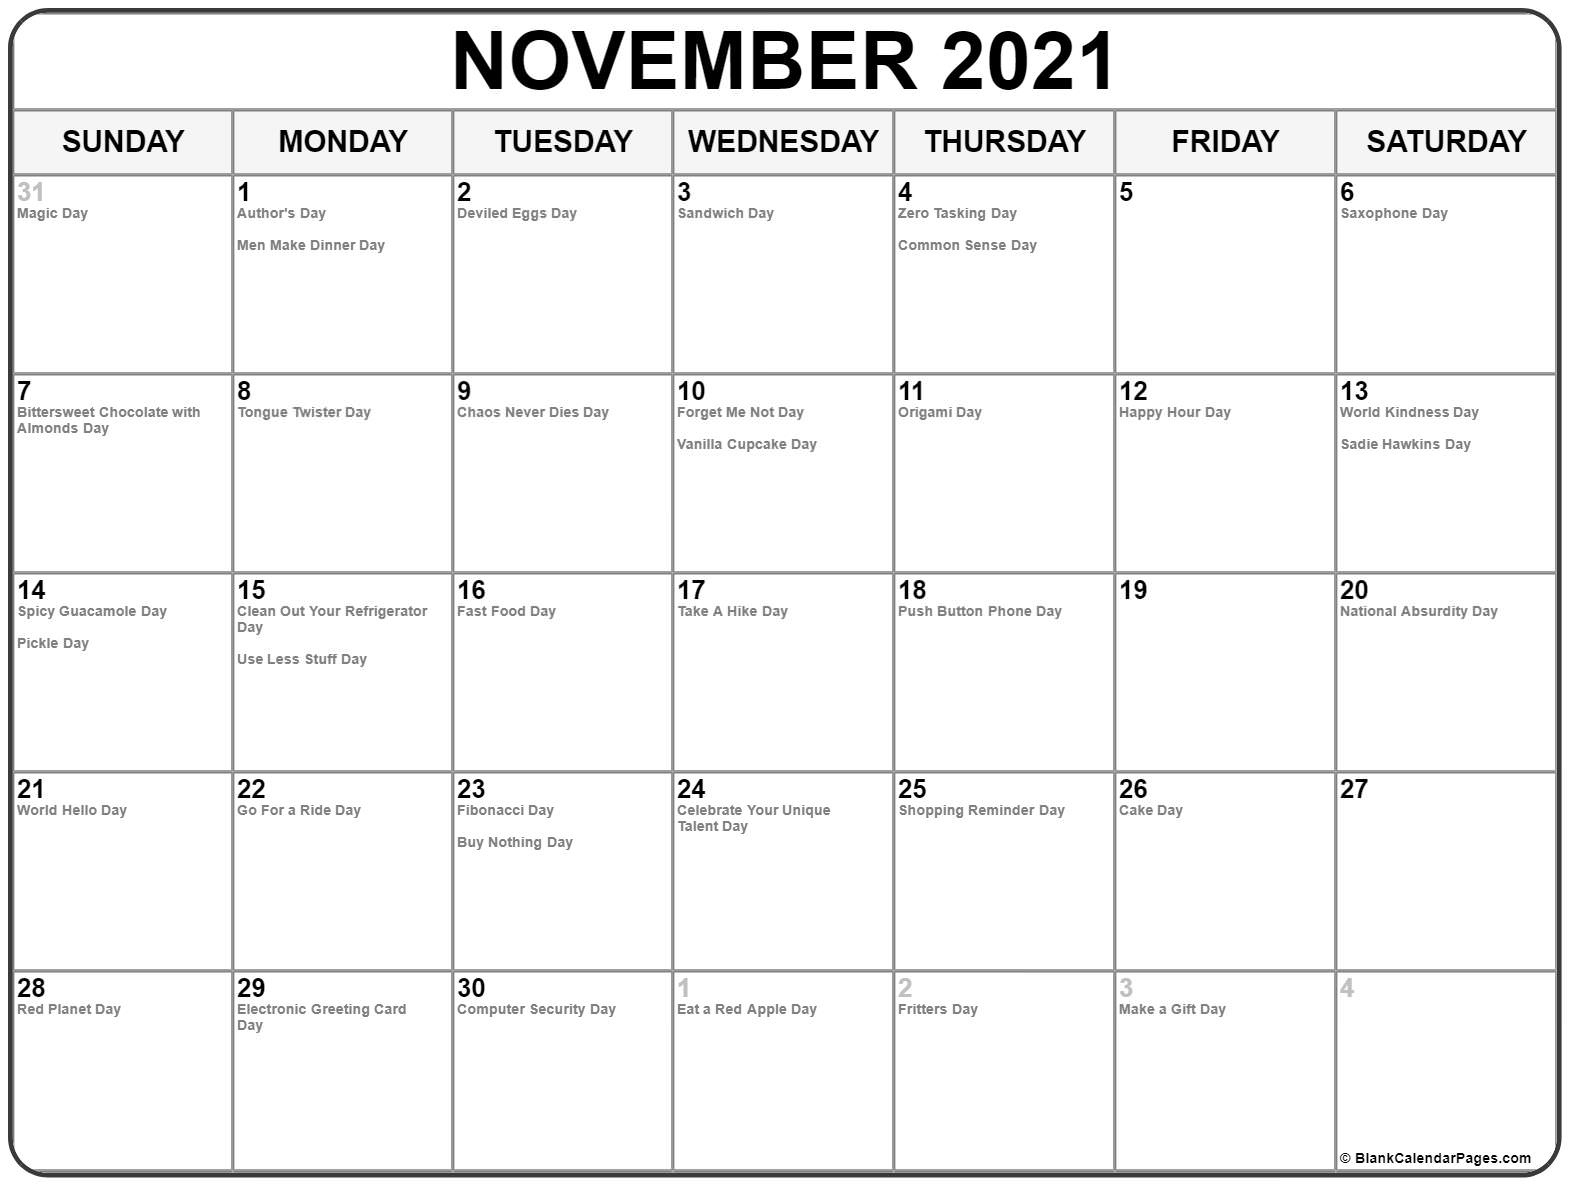 November 2021 Calendar With Holidays Free Printable November 2021 Calendar With Holidays